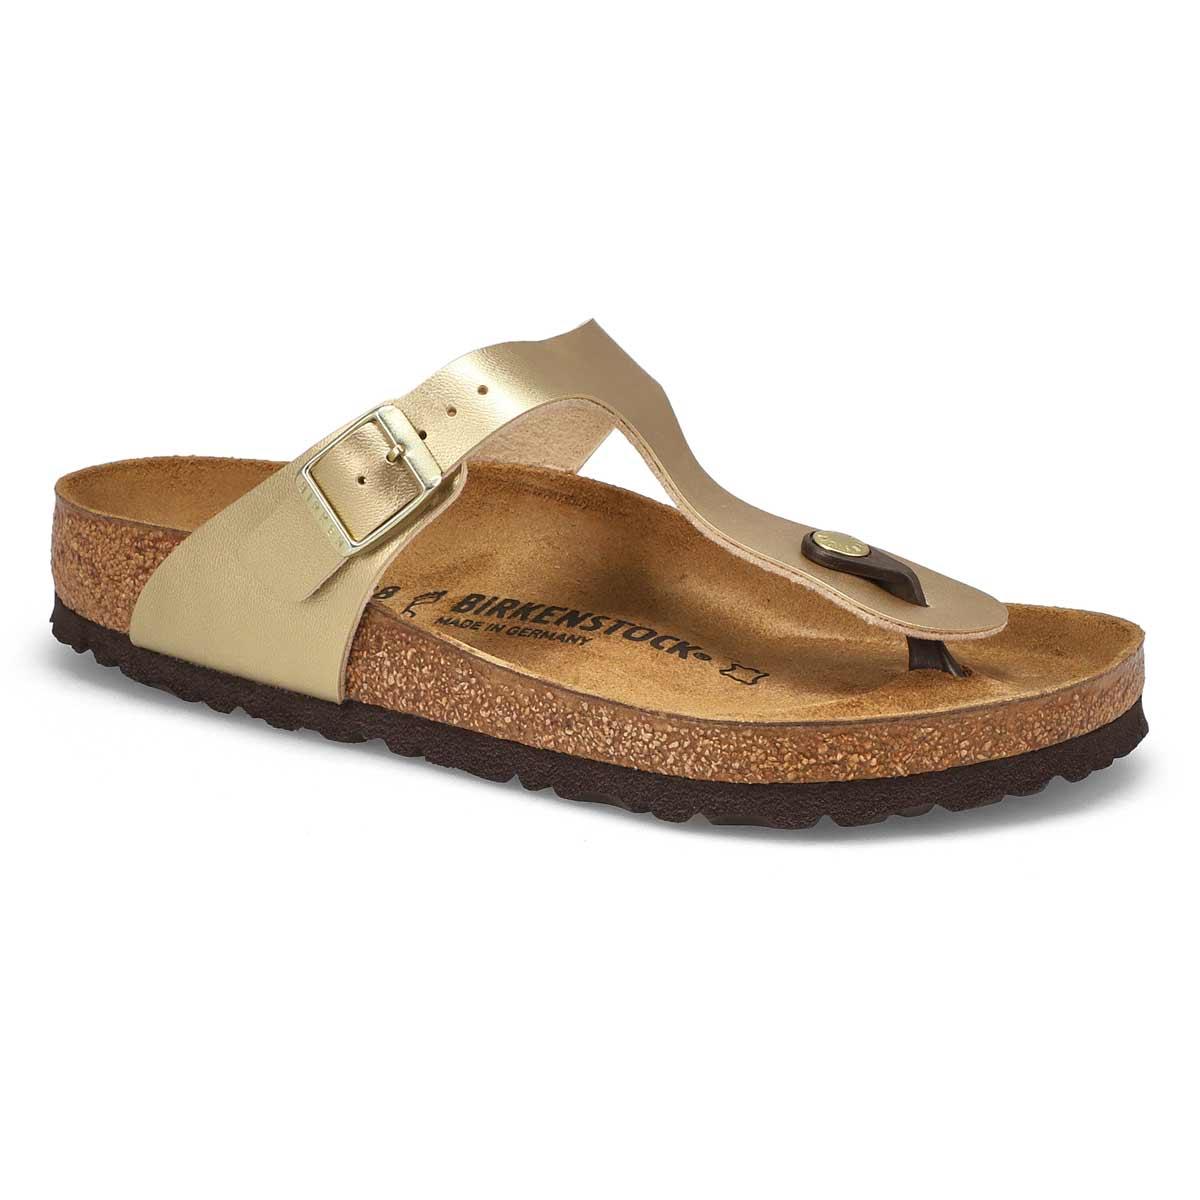 Lds Gizeh BF gold thong sandal